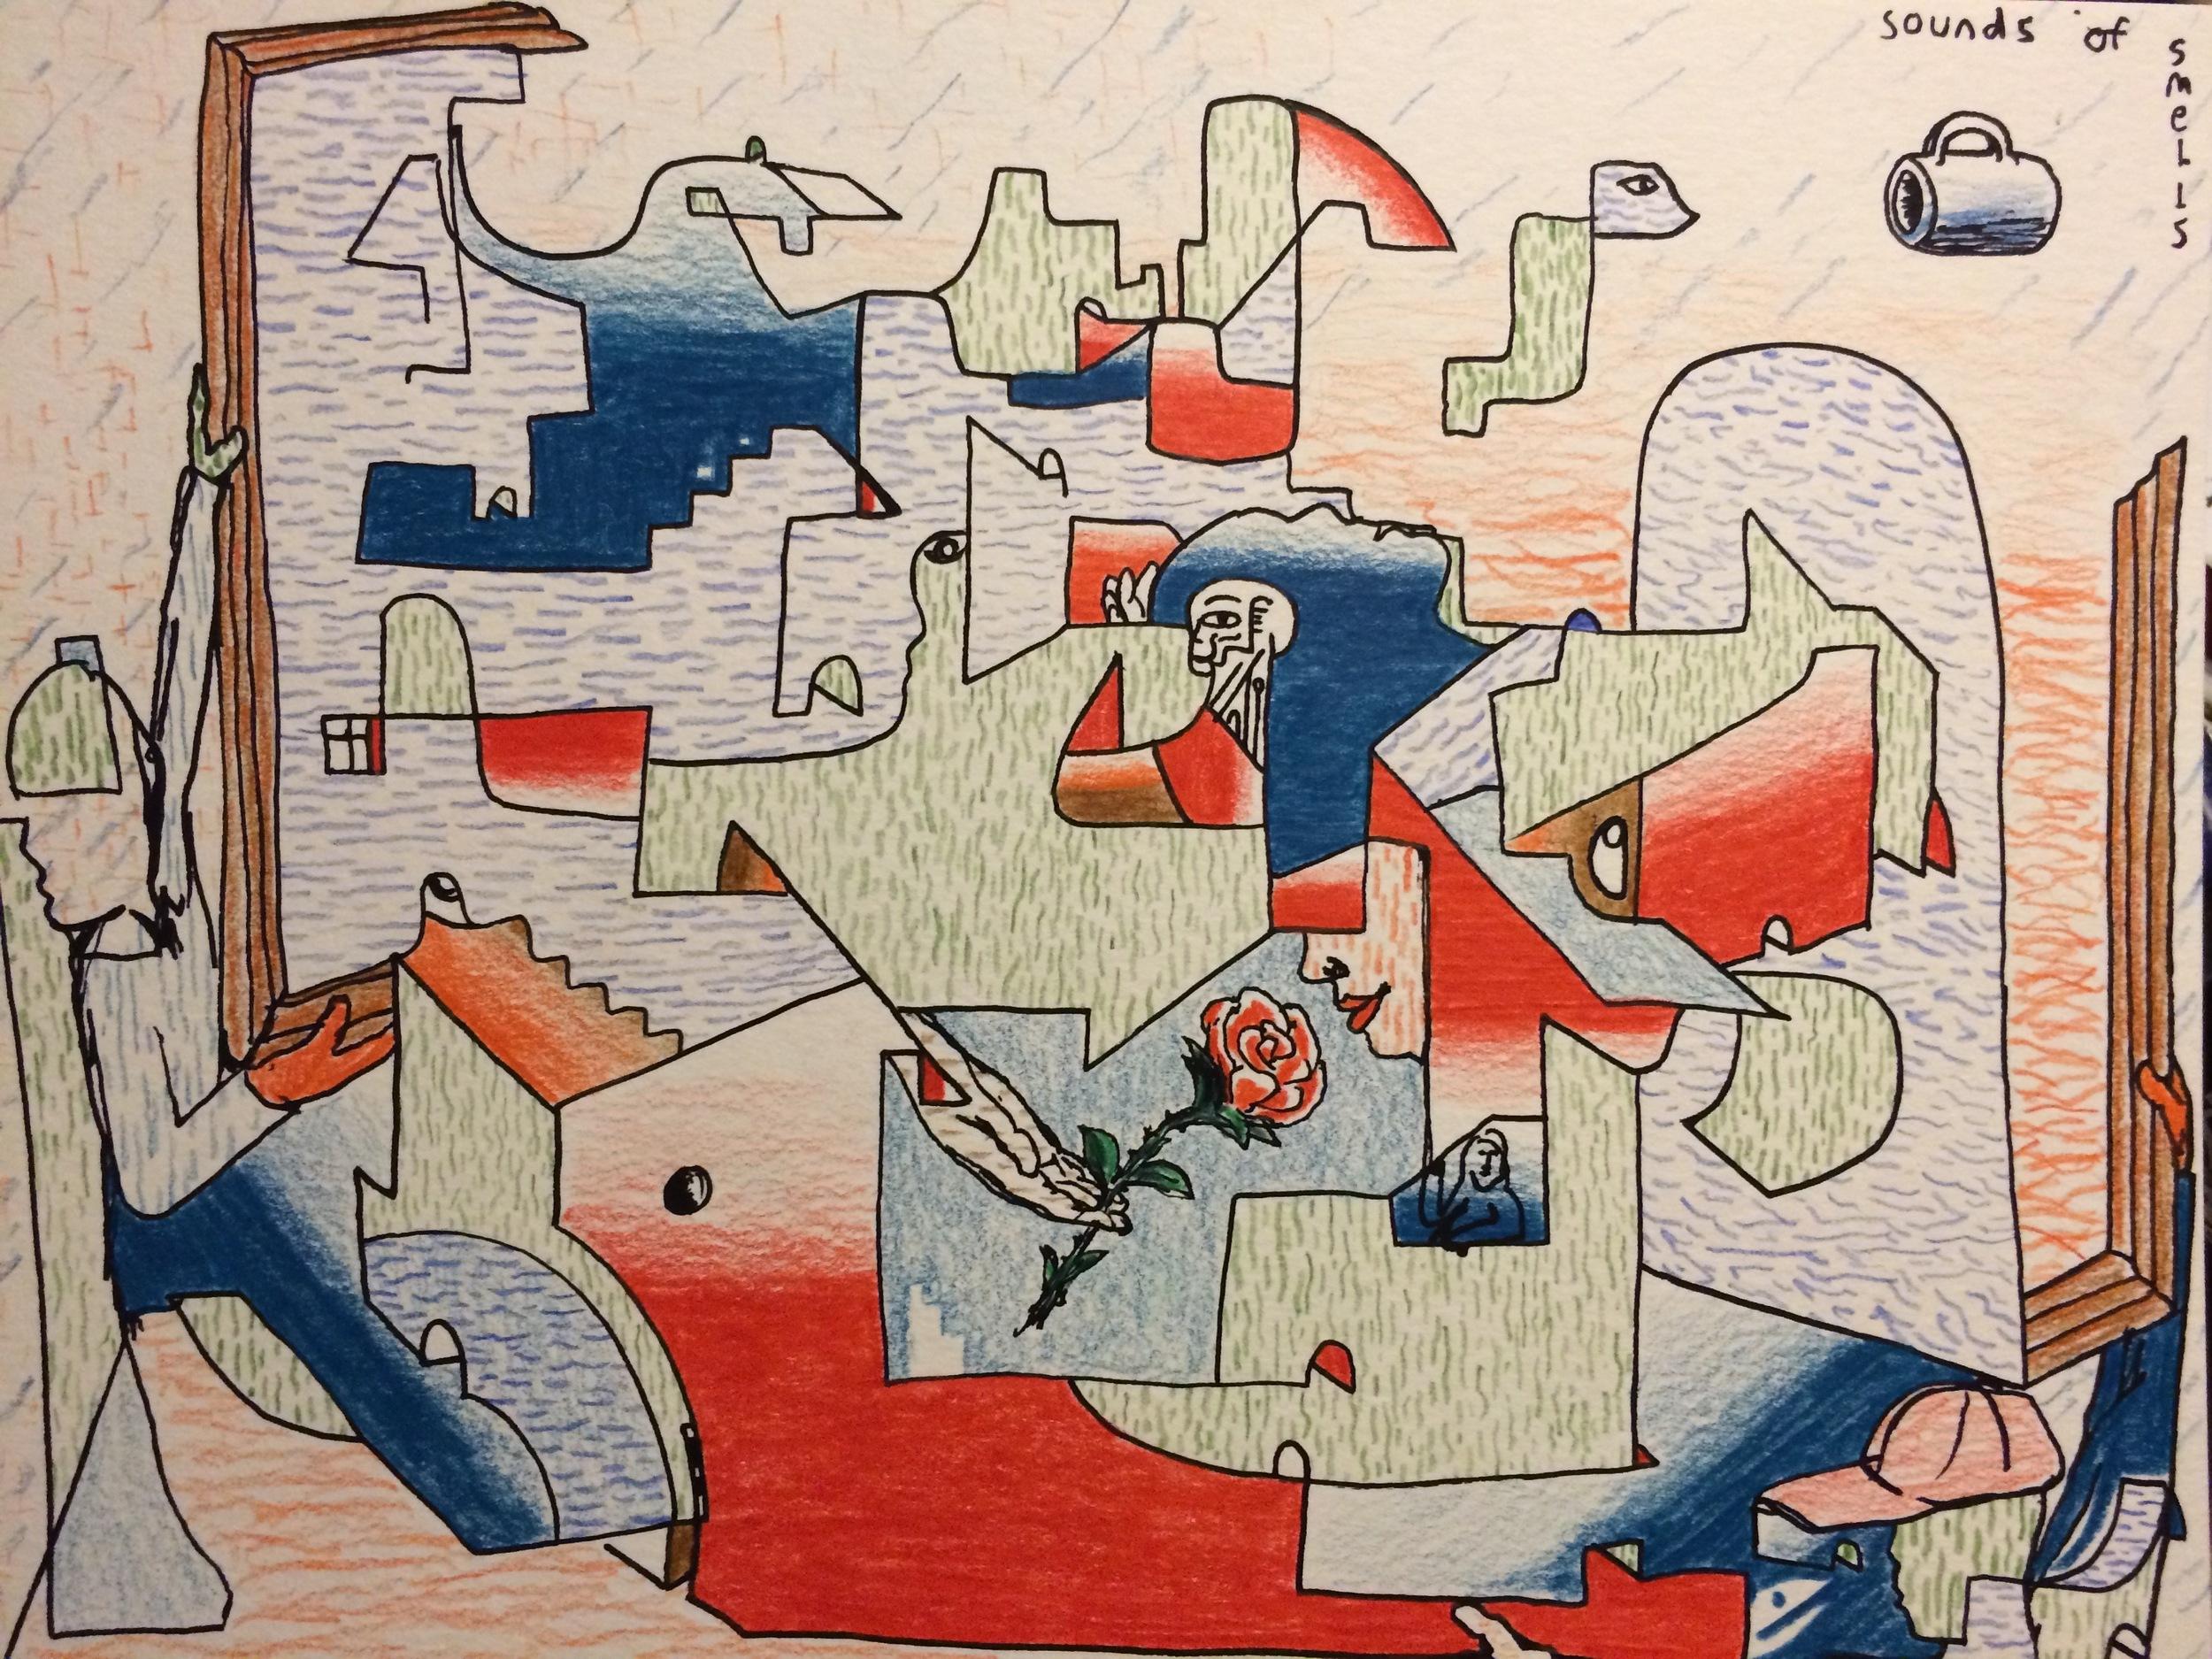 Alex Fatemi Sounds Of Smells, 2015 Color pencil on paper 9 x 12 inches $120